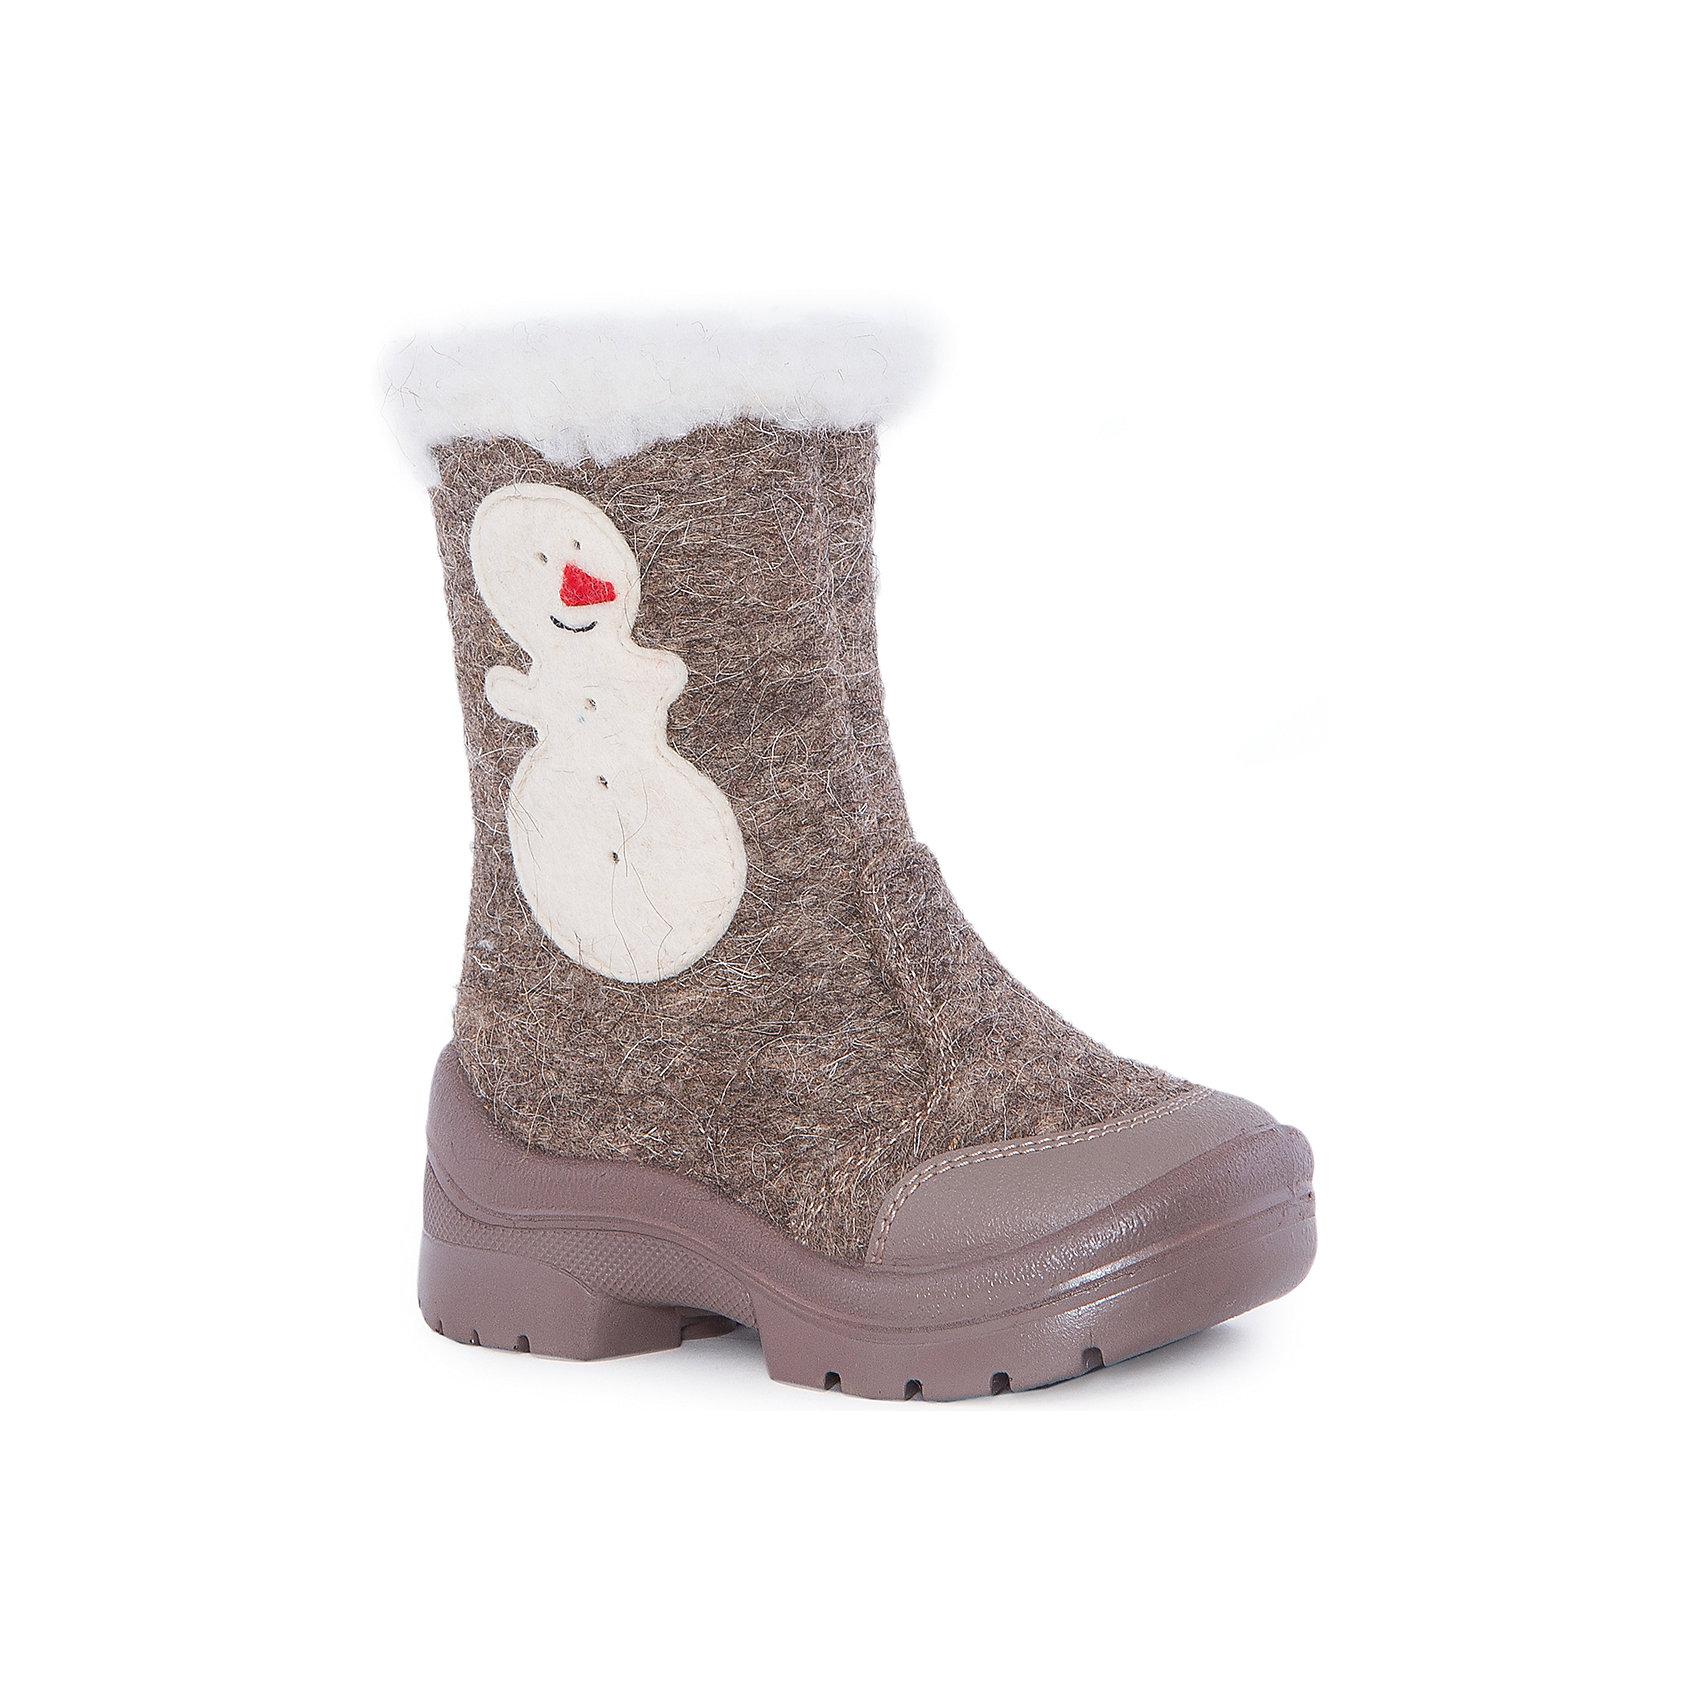 Филипок Валенки Снеговик Филипок валенки